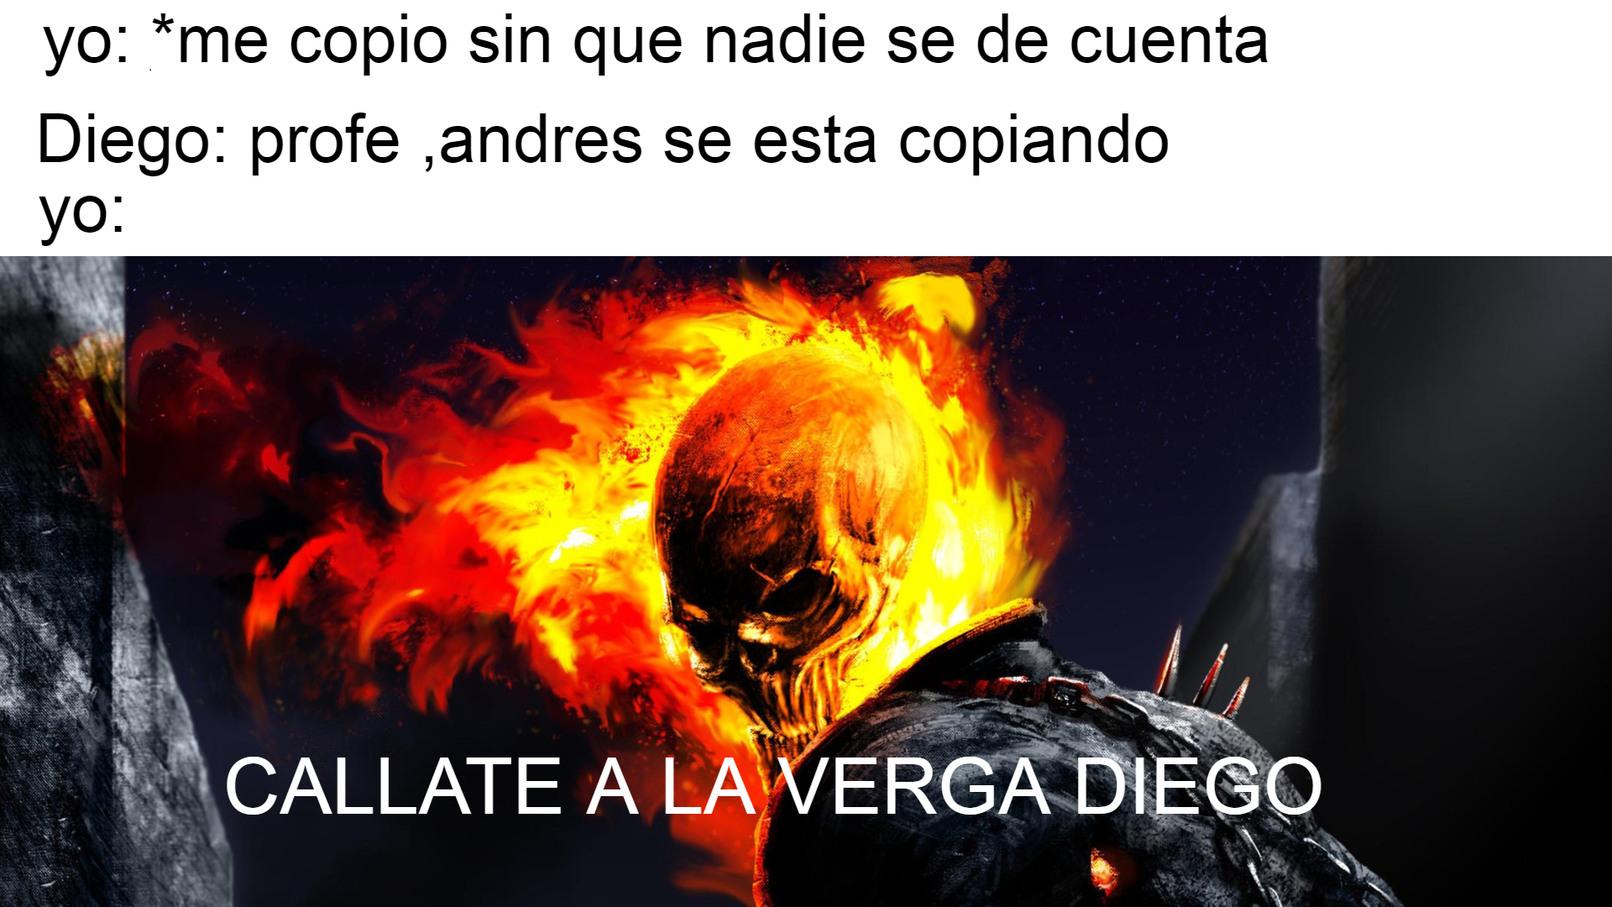 CALLATE A LA VERGA DIEGO - meme